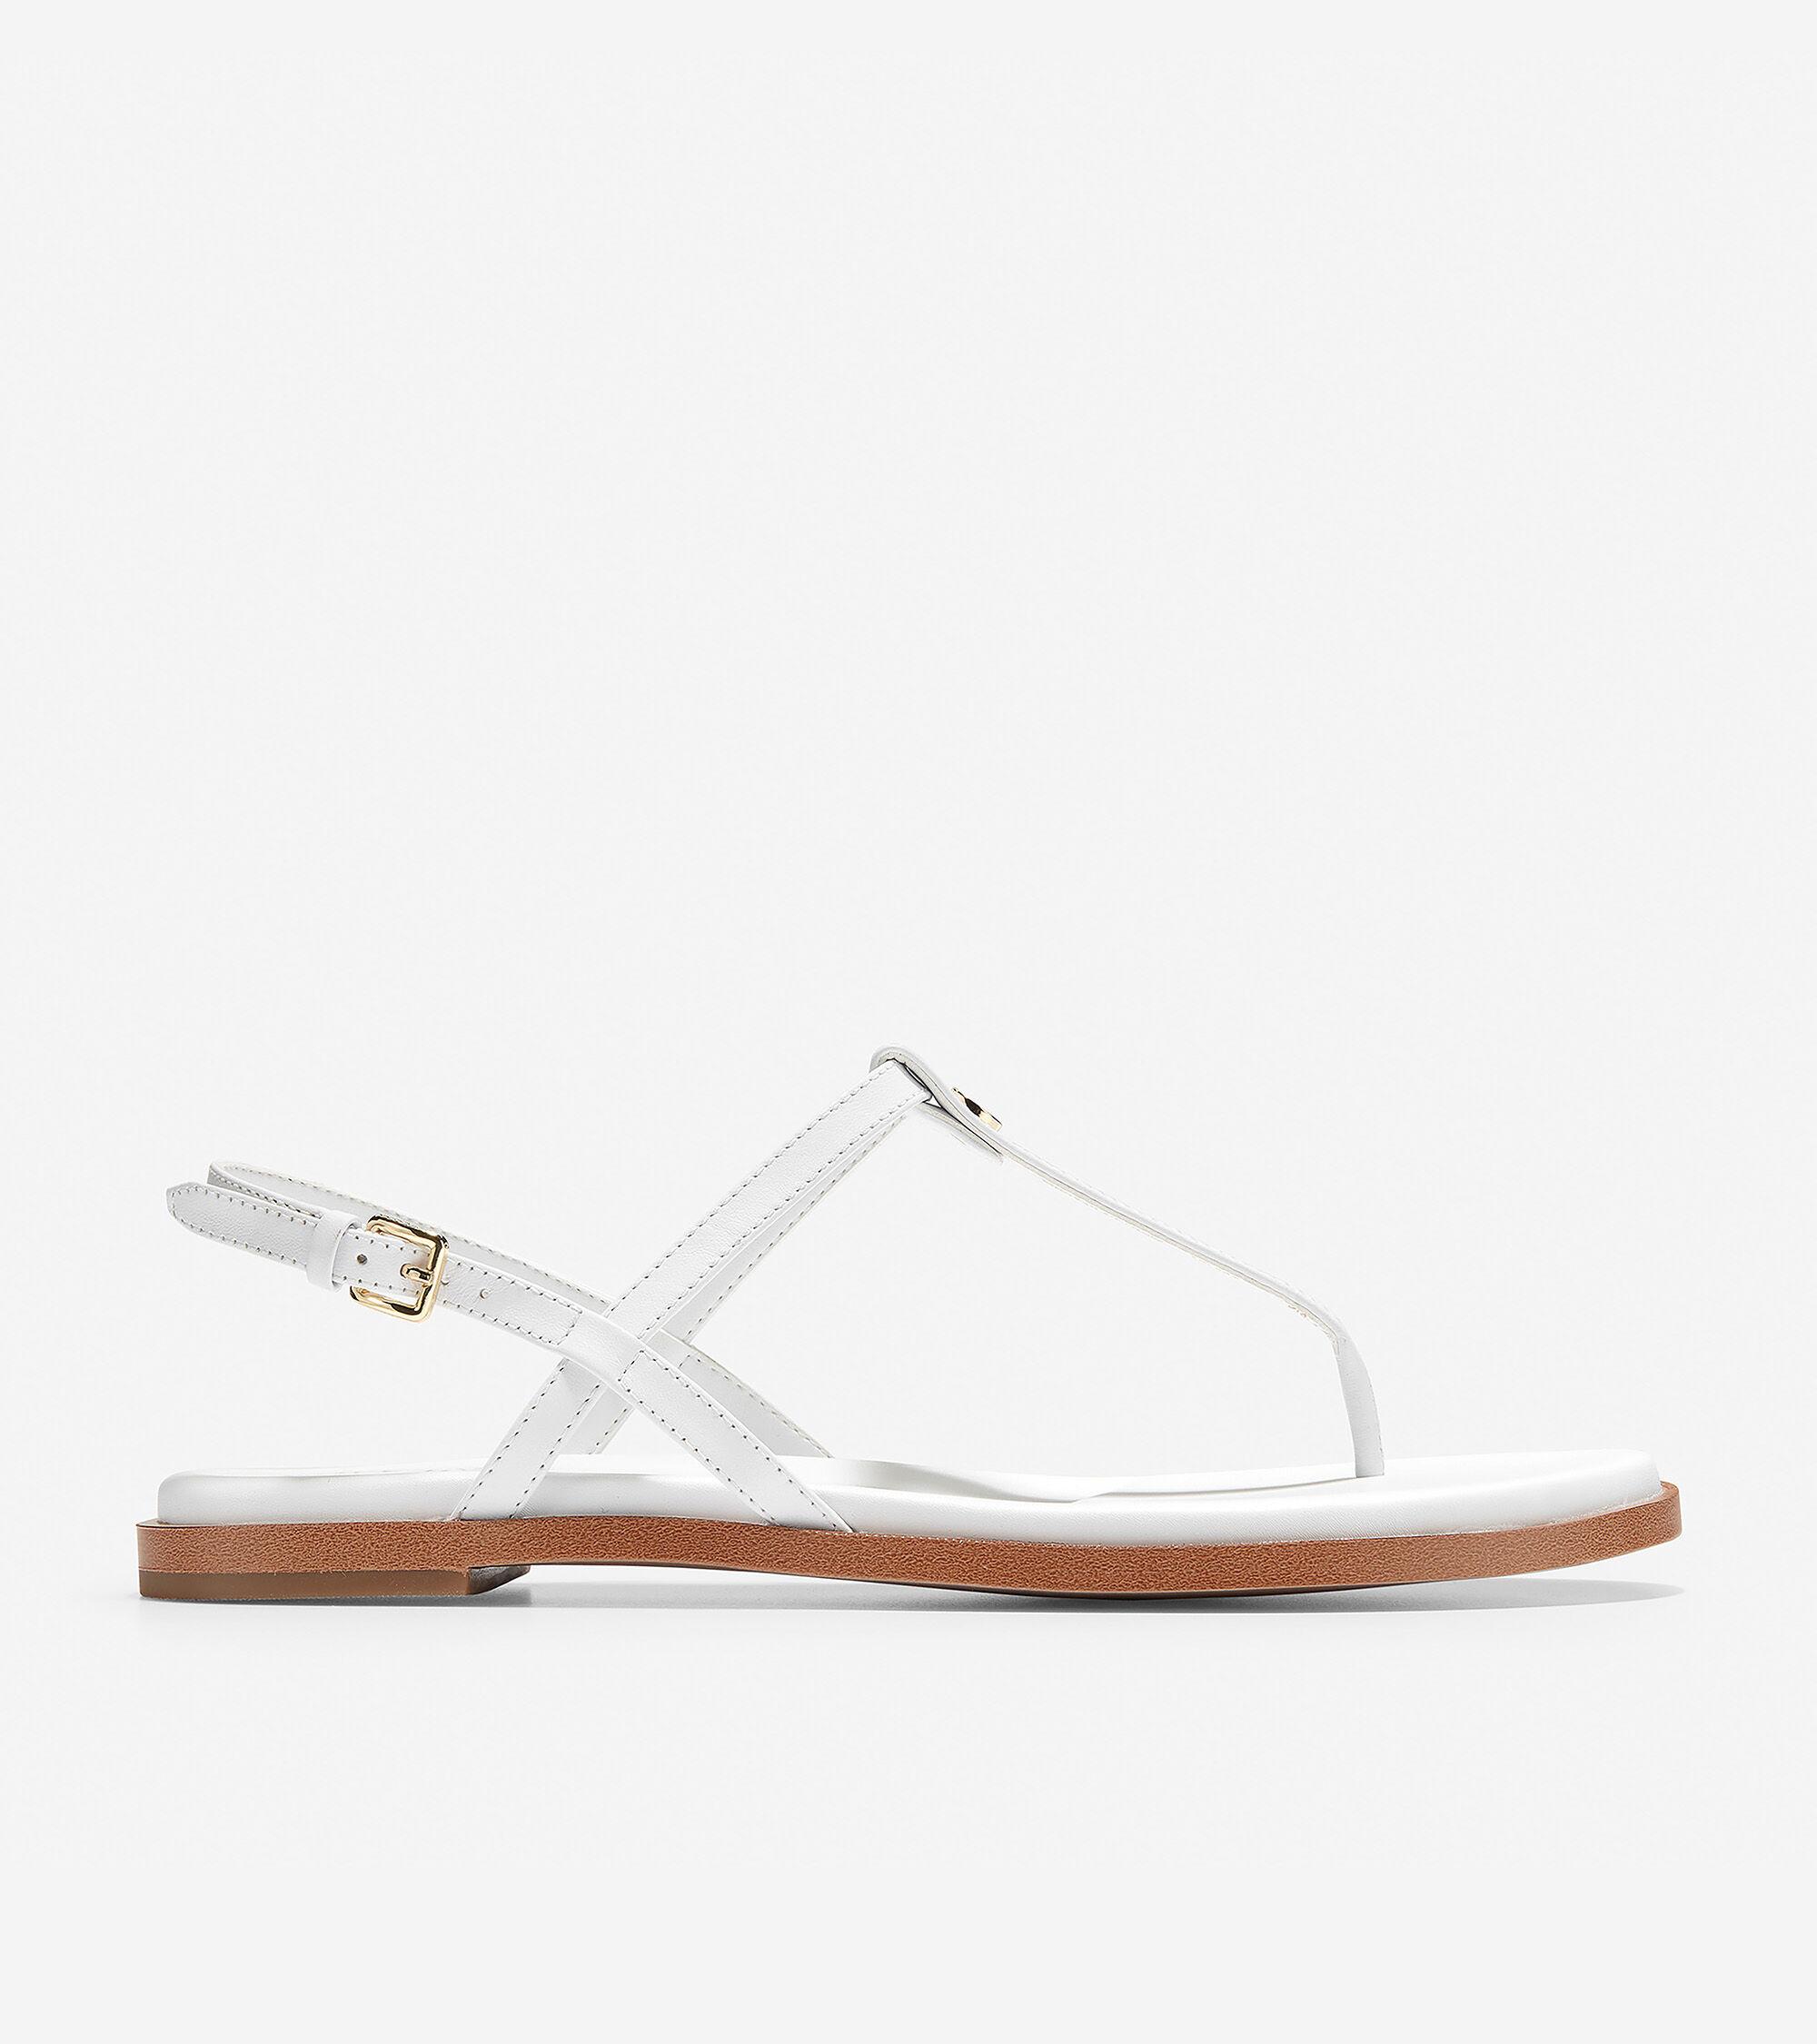 Women's Flora Thong Sandal in Optic